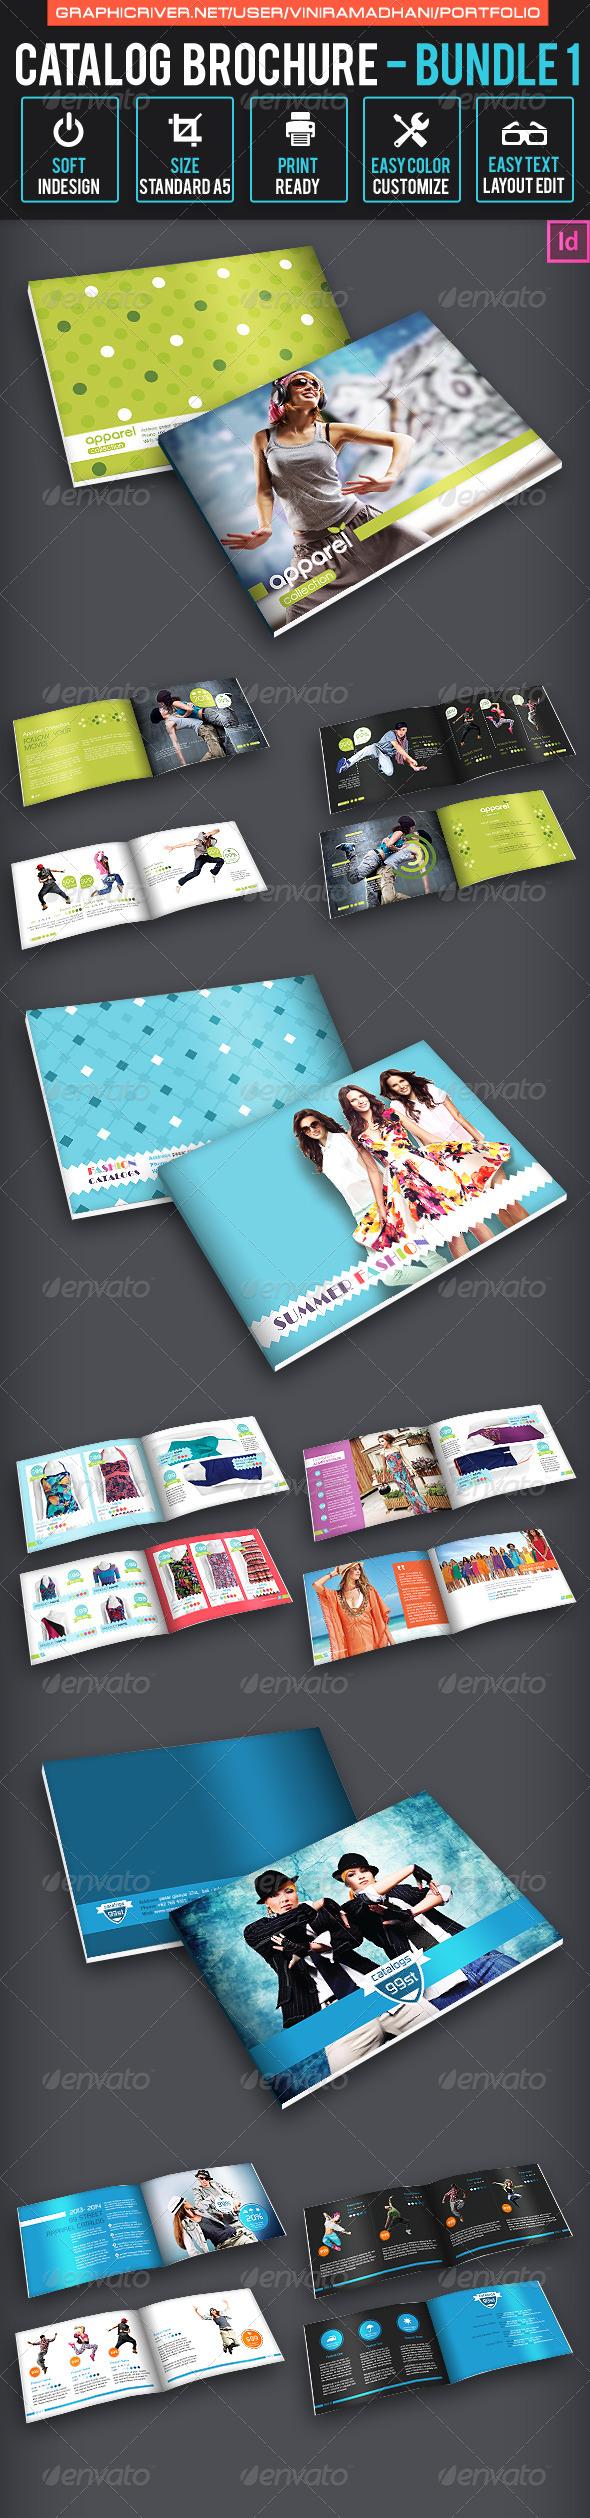 GraphicRiver Catalog Brochure Bundle 1 7029831